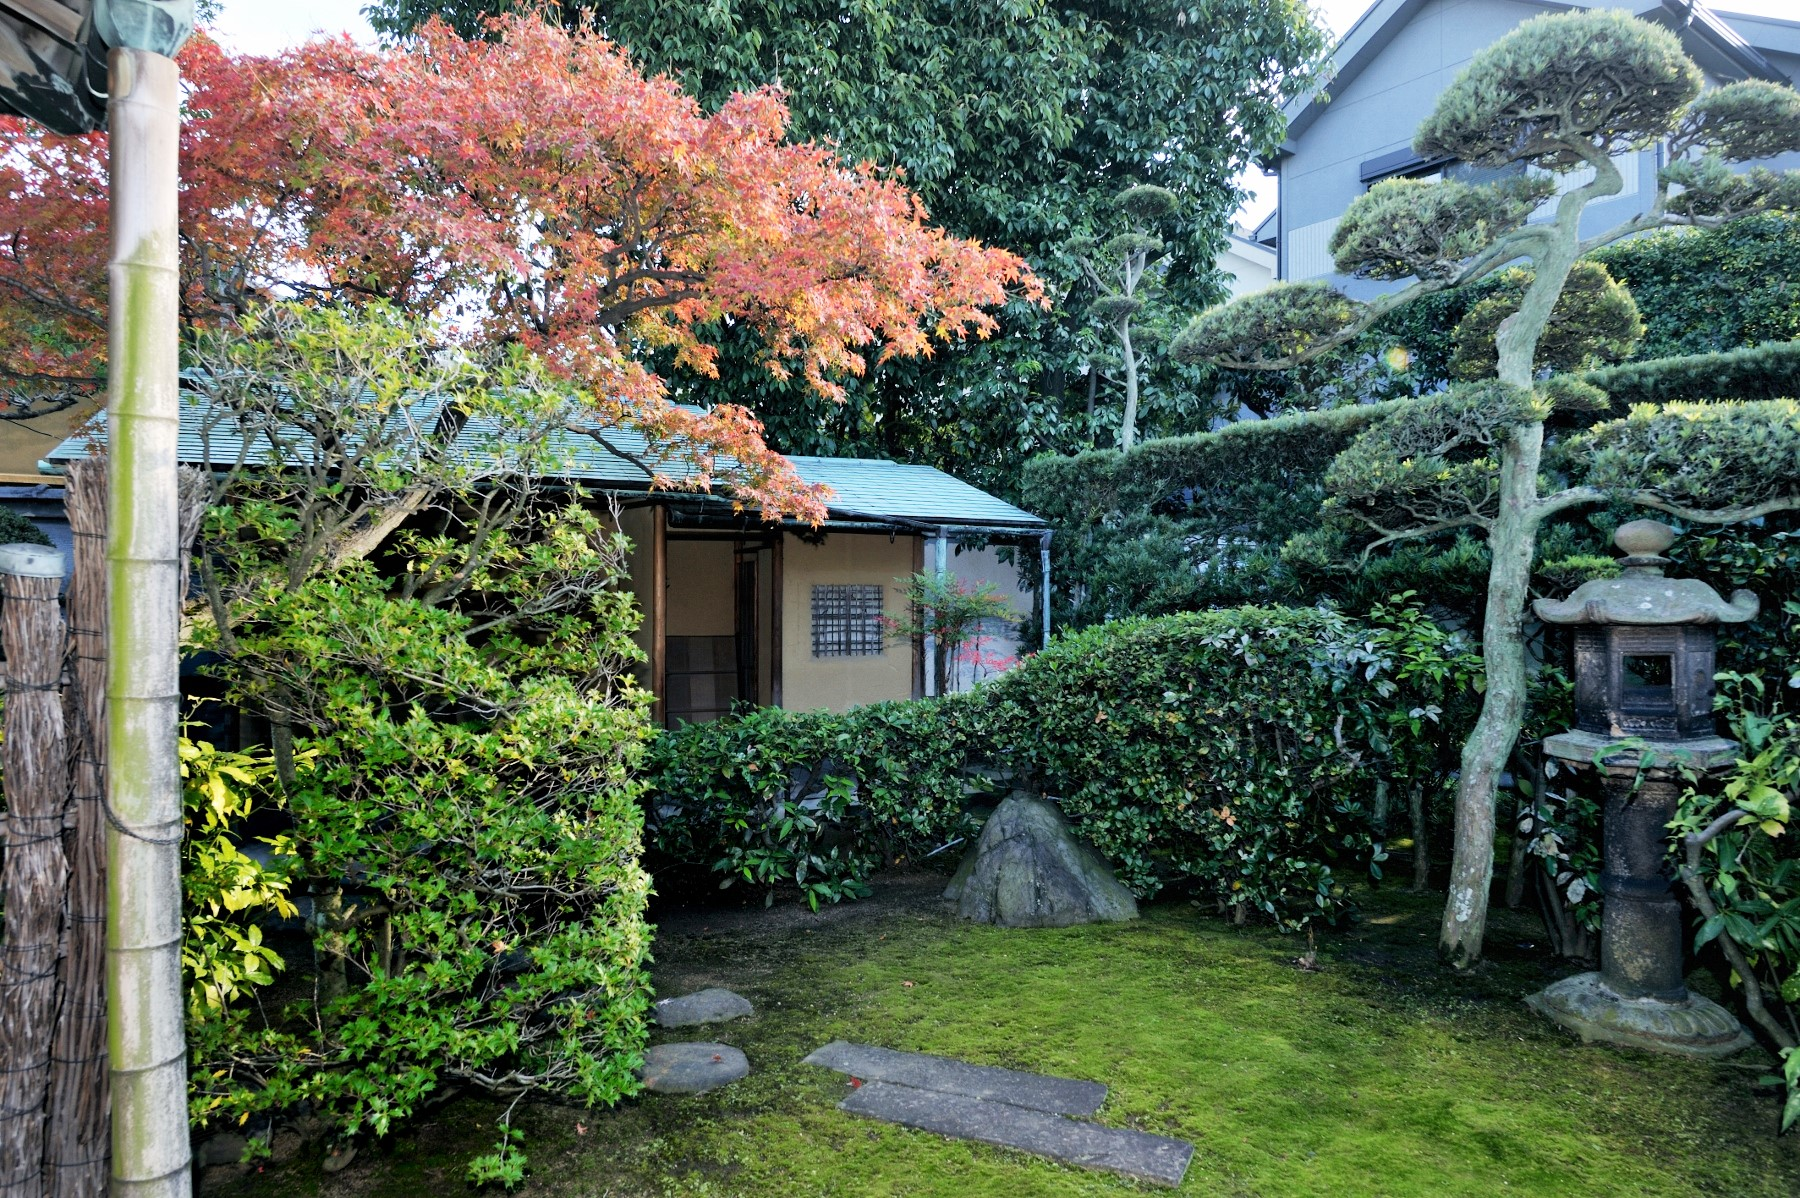 <p>庭と腰掛待合</p>主屋南東側の塀沿いに建つ。招屋根の銅板葺で、雪隠を落棟とする。腰掛部の壁は土壁、柱は丸太材である。